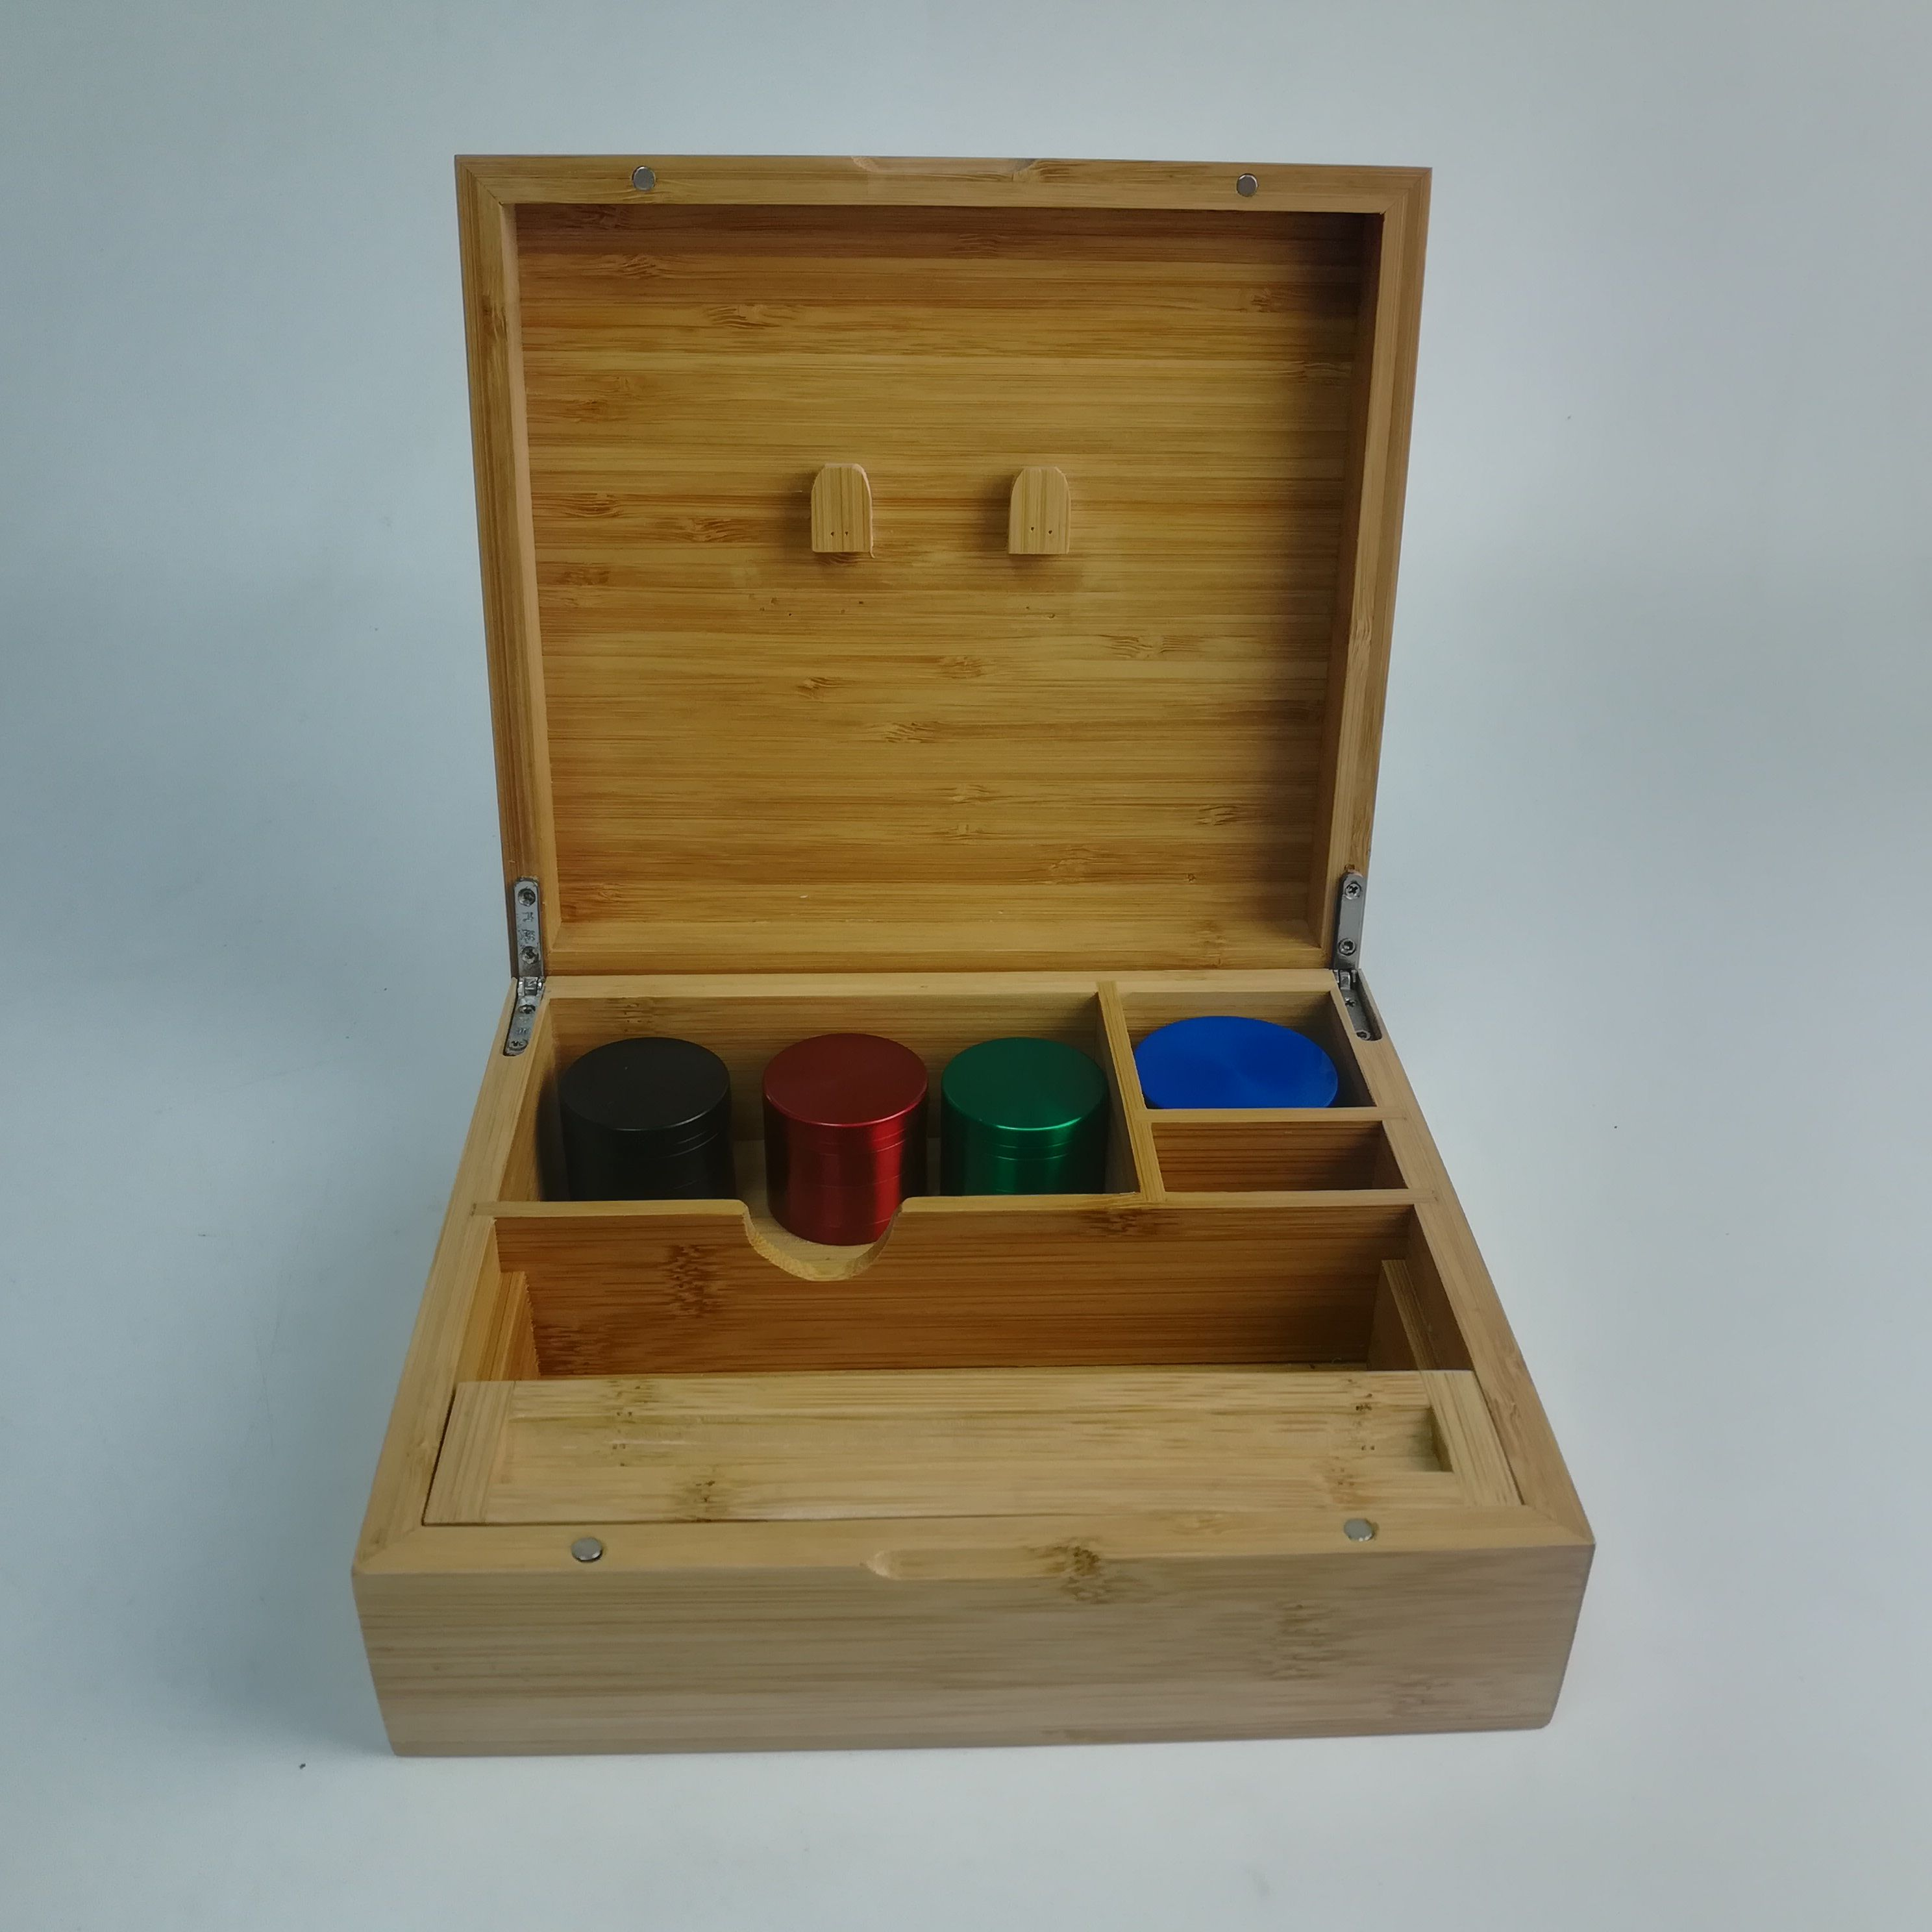 Bamboo Jewelry Box Cajas De Madera De Madera Cajas